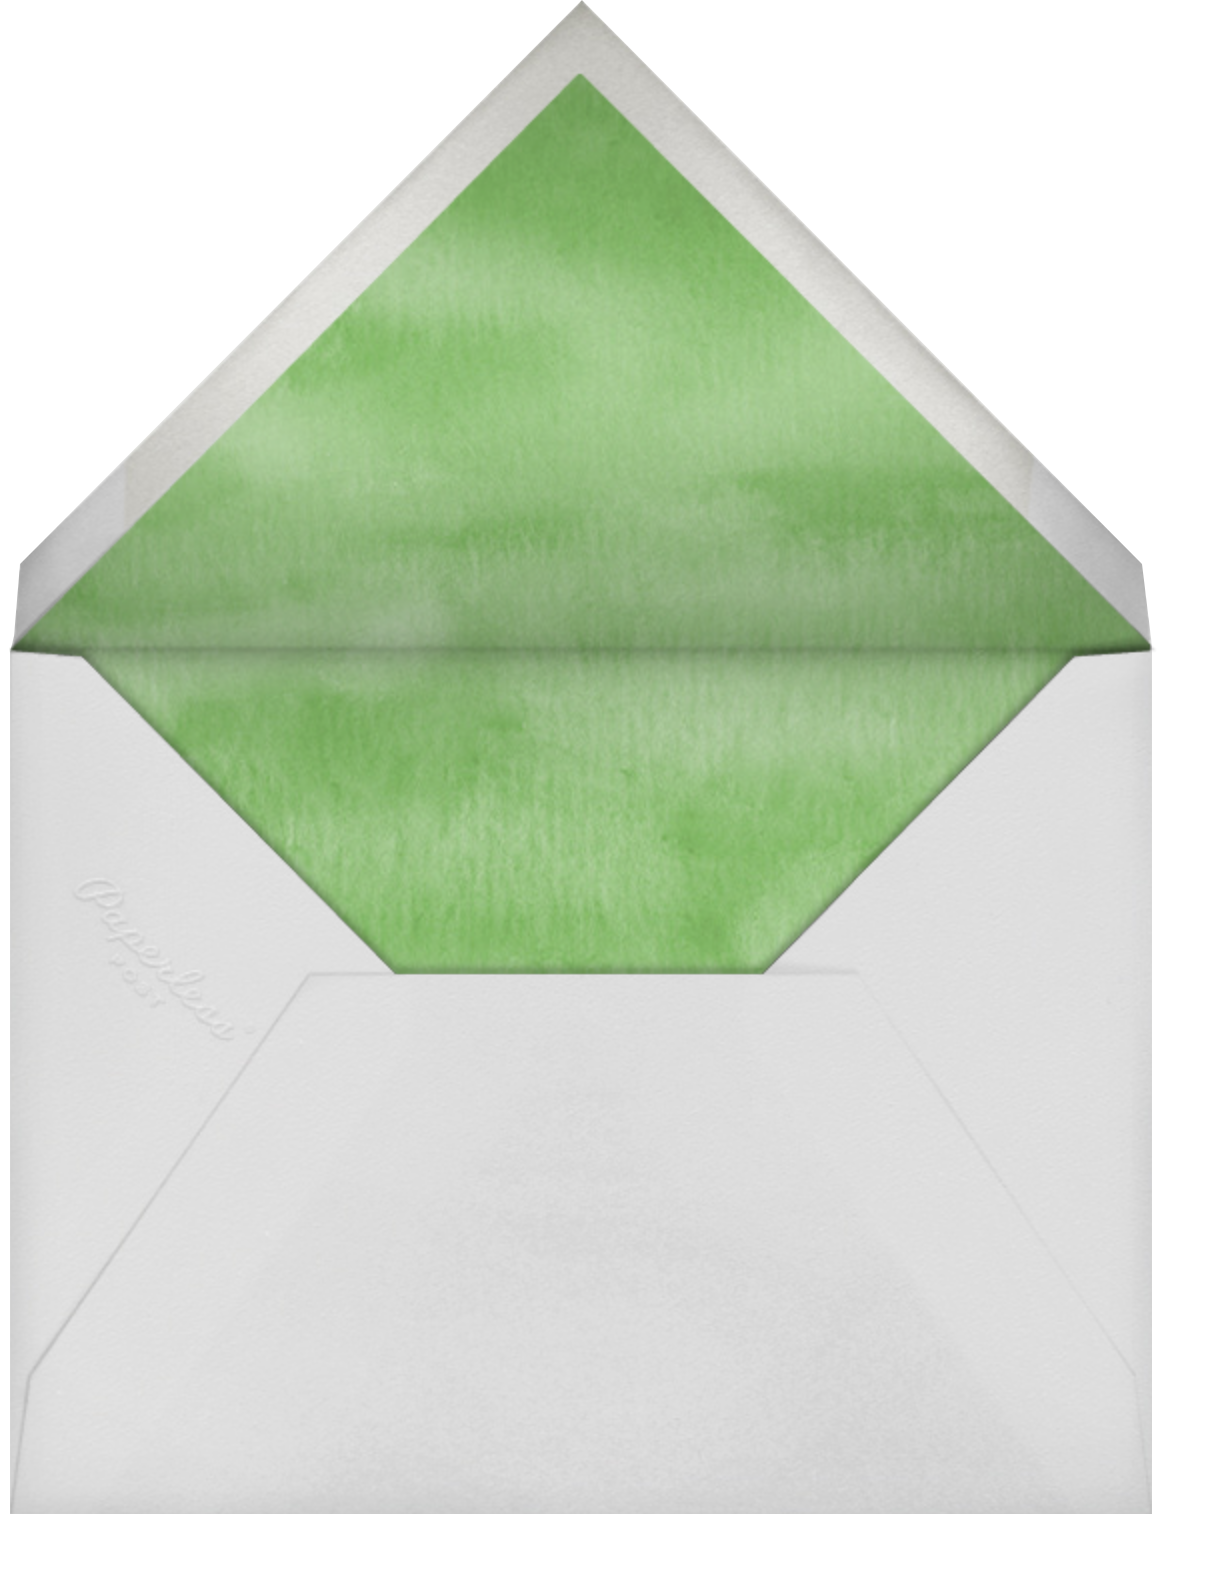 Naiad - Felix Doolittle - Baby shower - envelope back